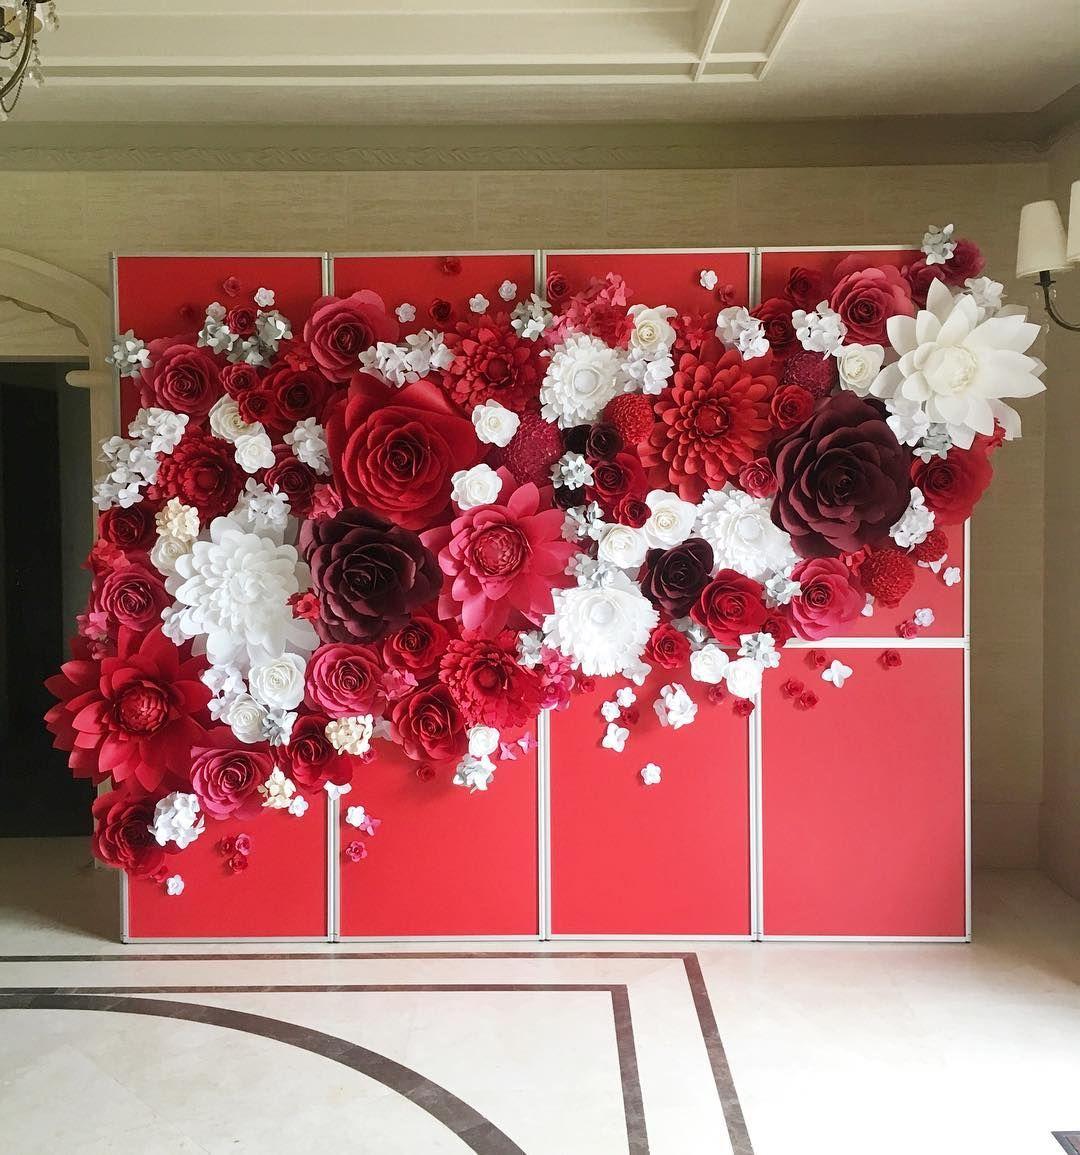 Enjoy Our New Paper Flower Wall Paperflowerwall